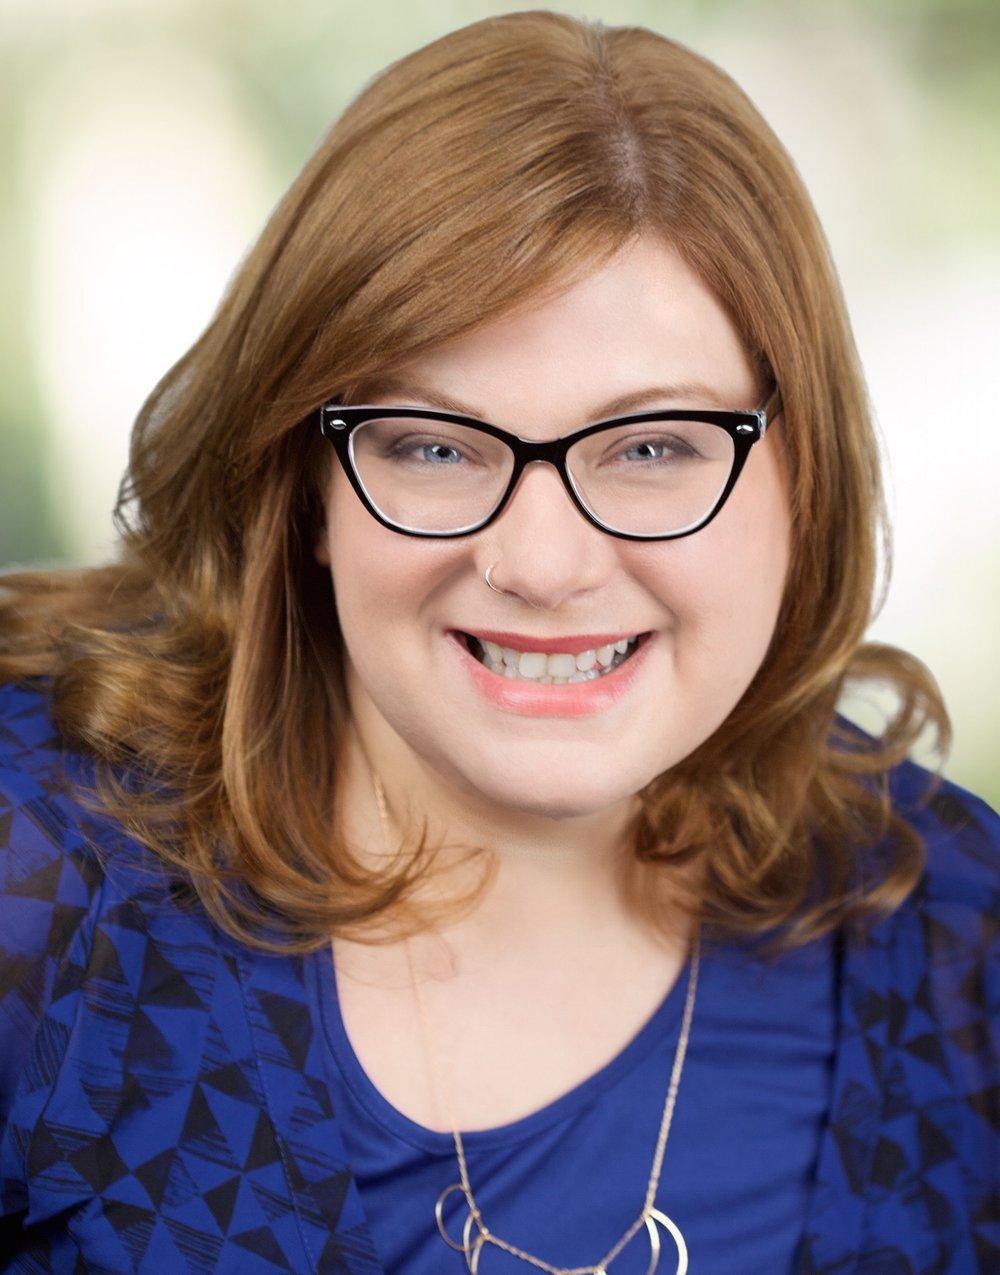 Karalyn-Violeta-LMSW-psychotherapist